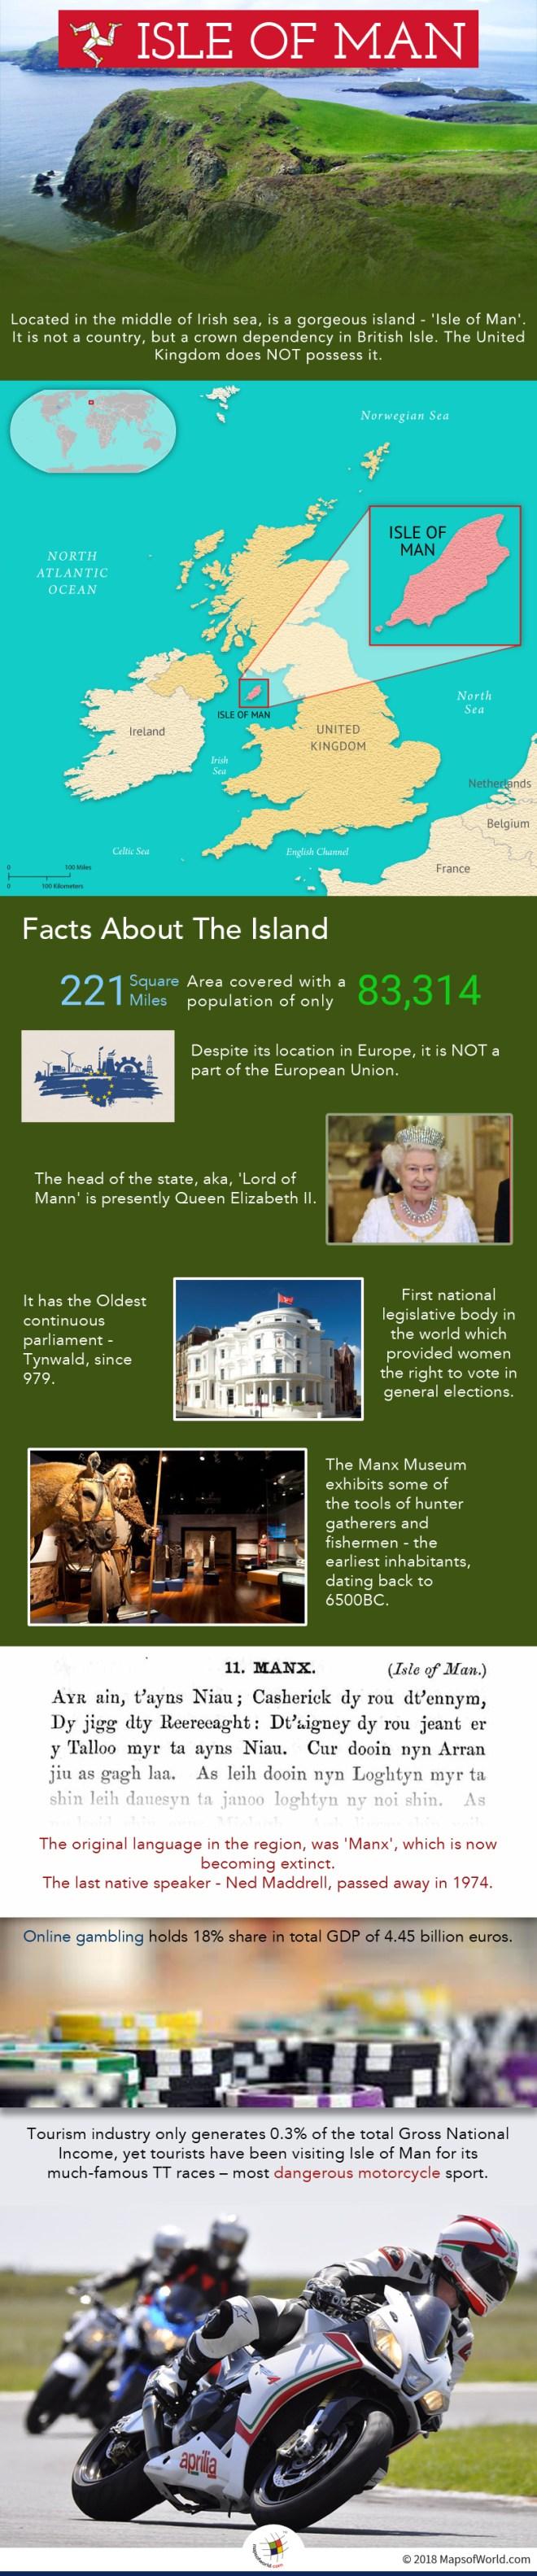 Isle of Man is a Crown Dependency in British Isle